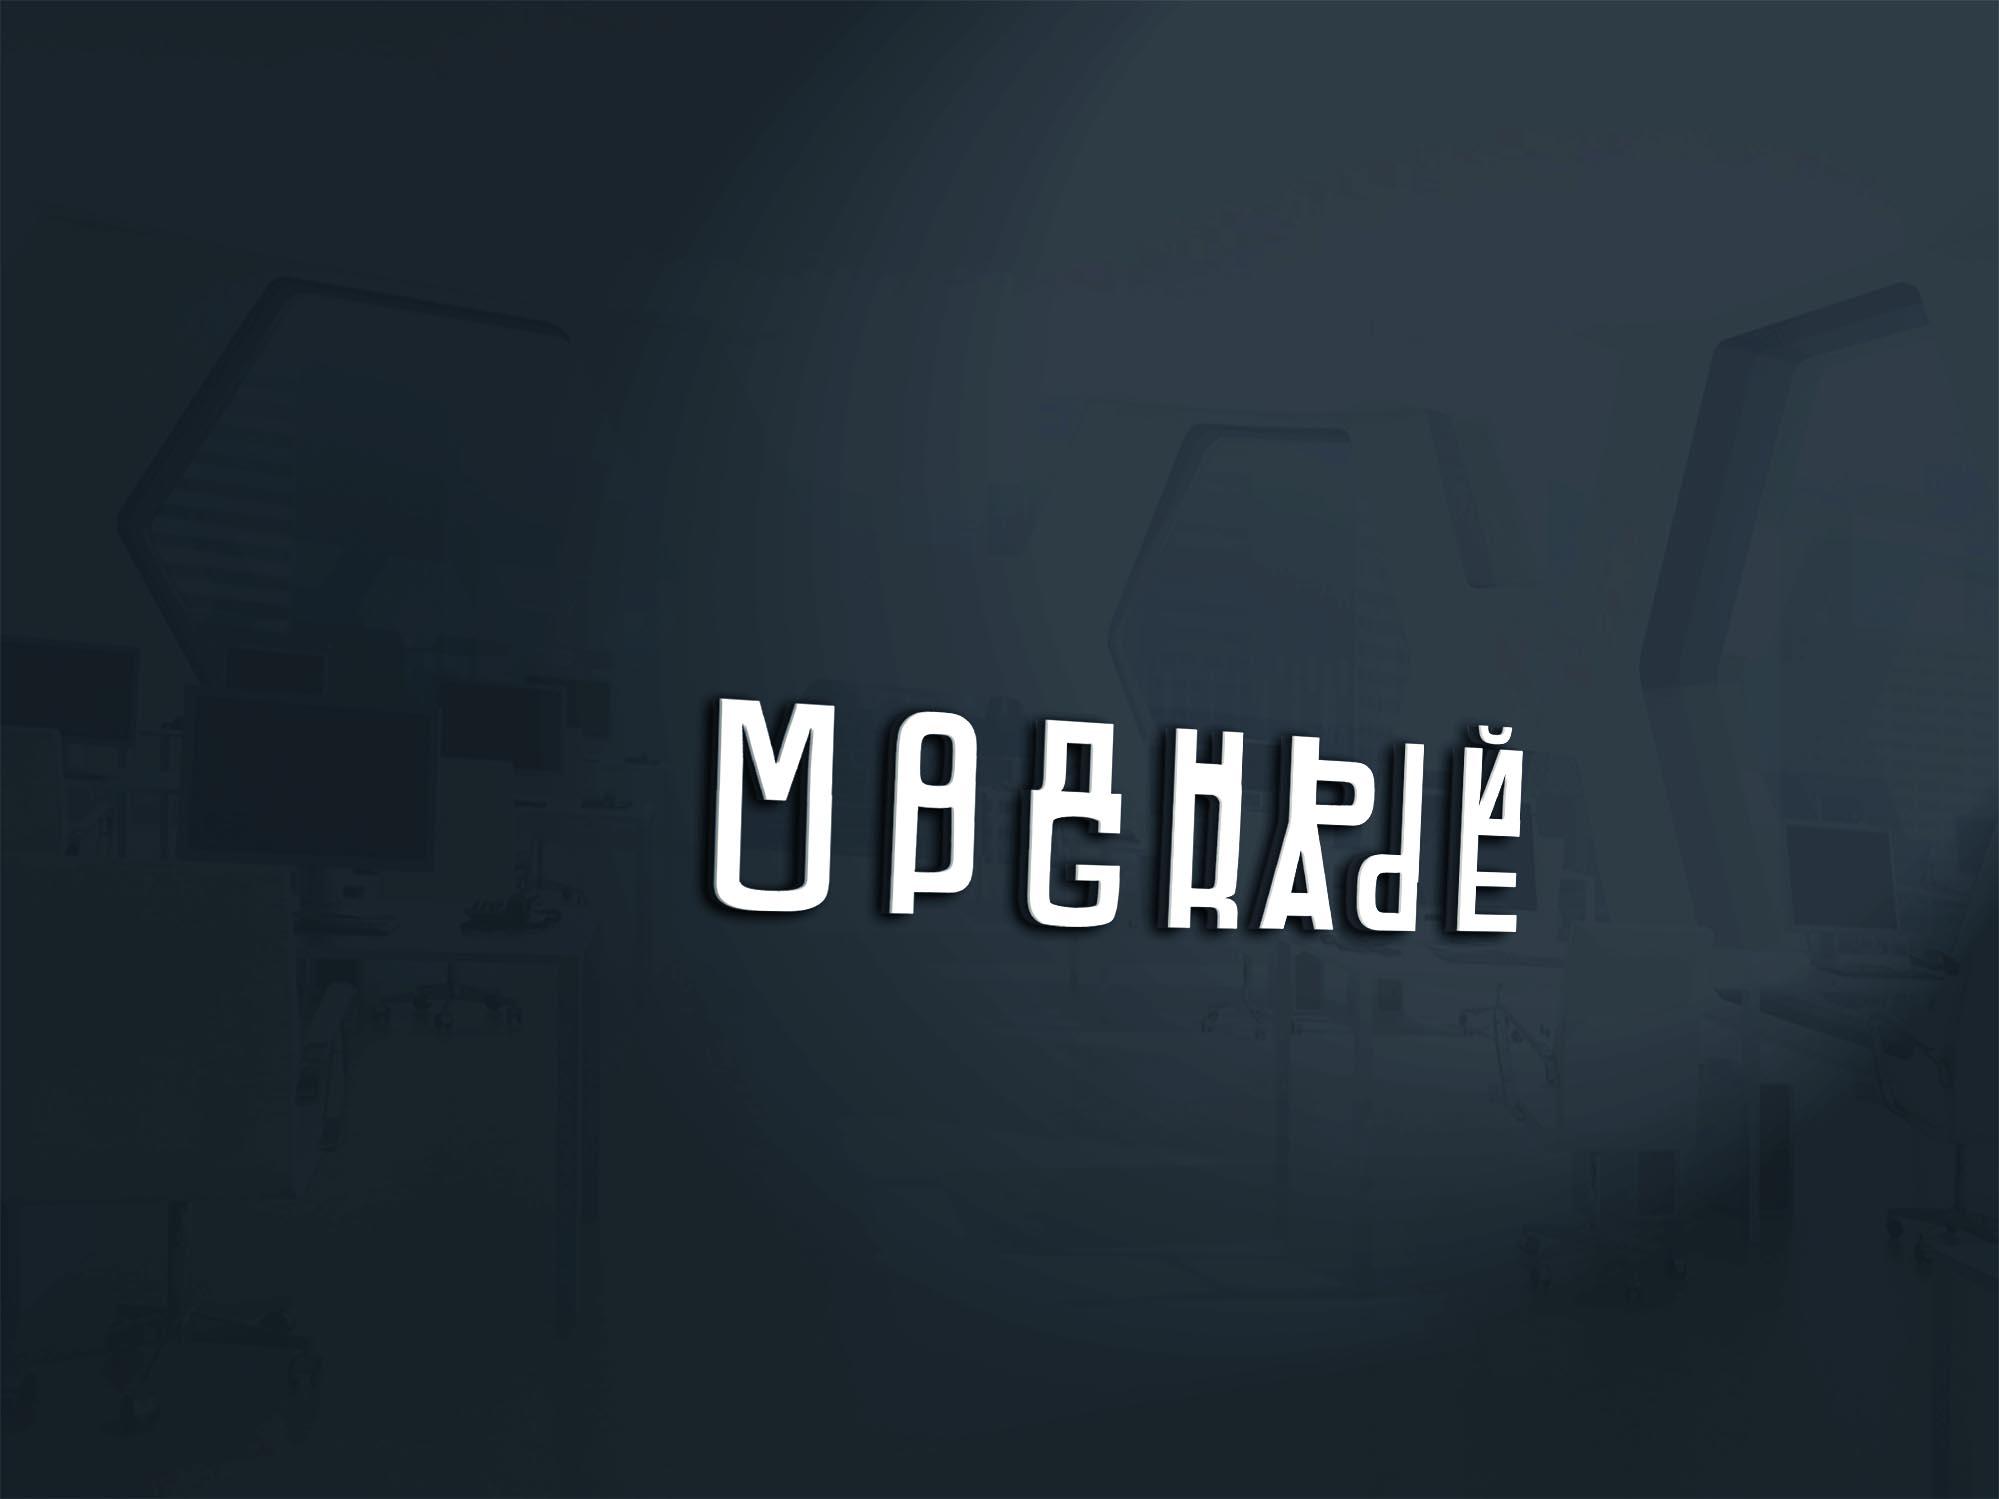 "Логотип интернет магазина ""Модный UPGRADE"" фото f_6255943871662eb1.jpg"